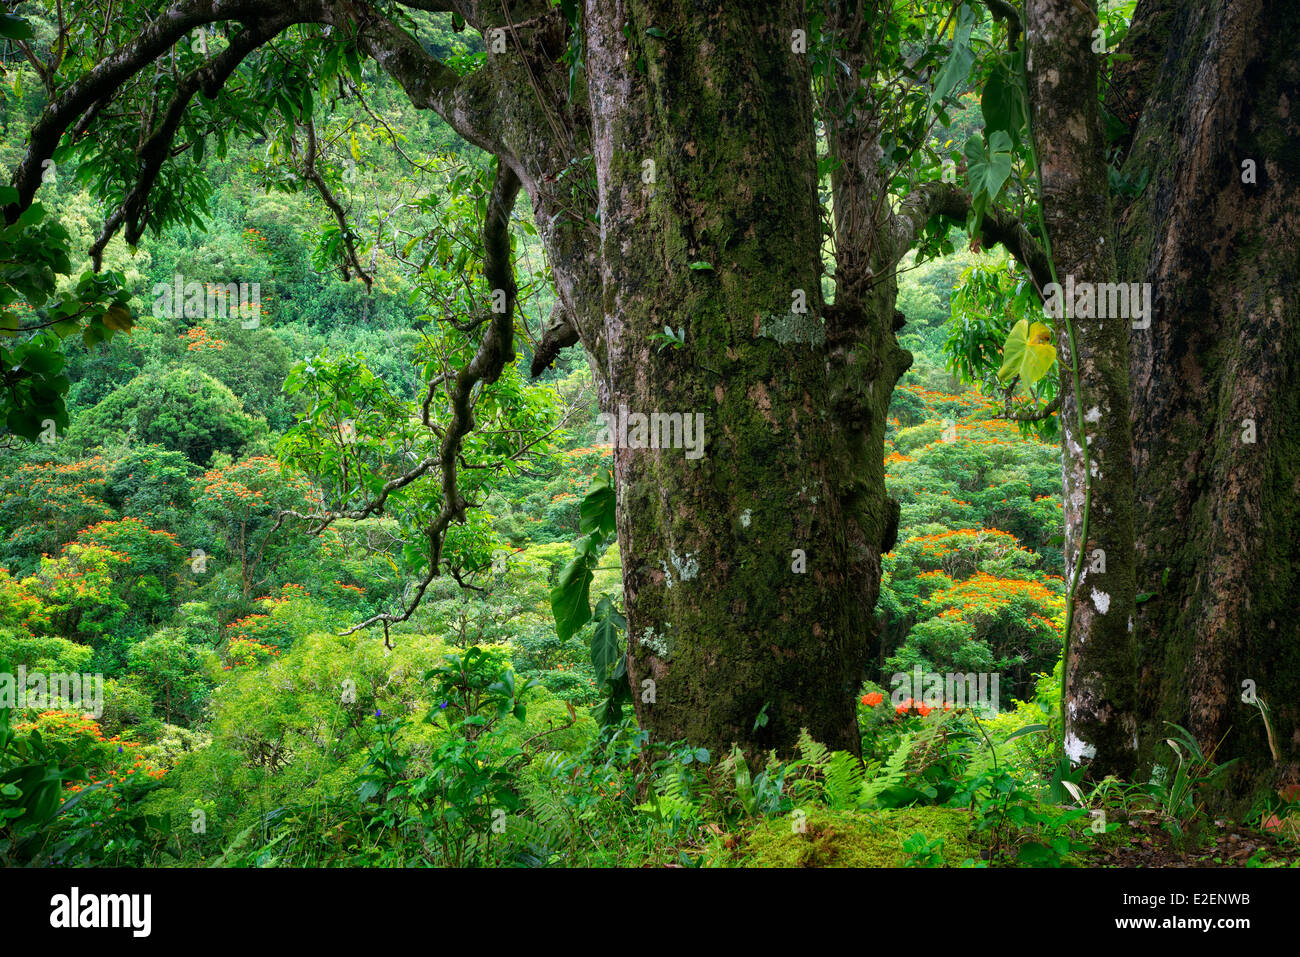 African Tulip Trees as seen through trees on road to Hana. Maui, Hawaii - Stock Image